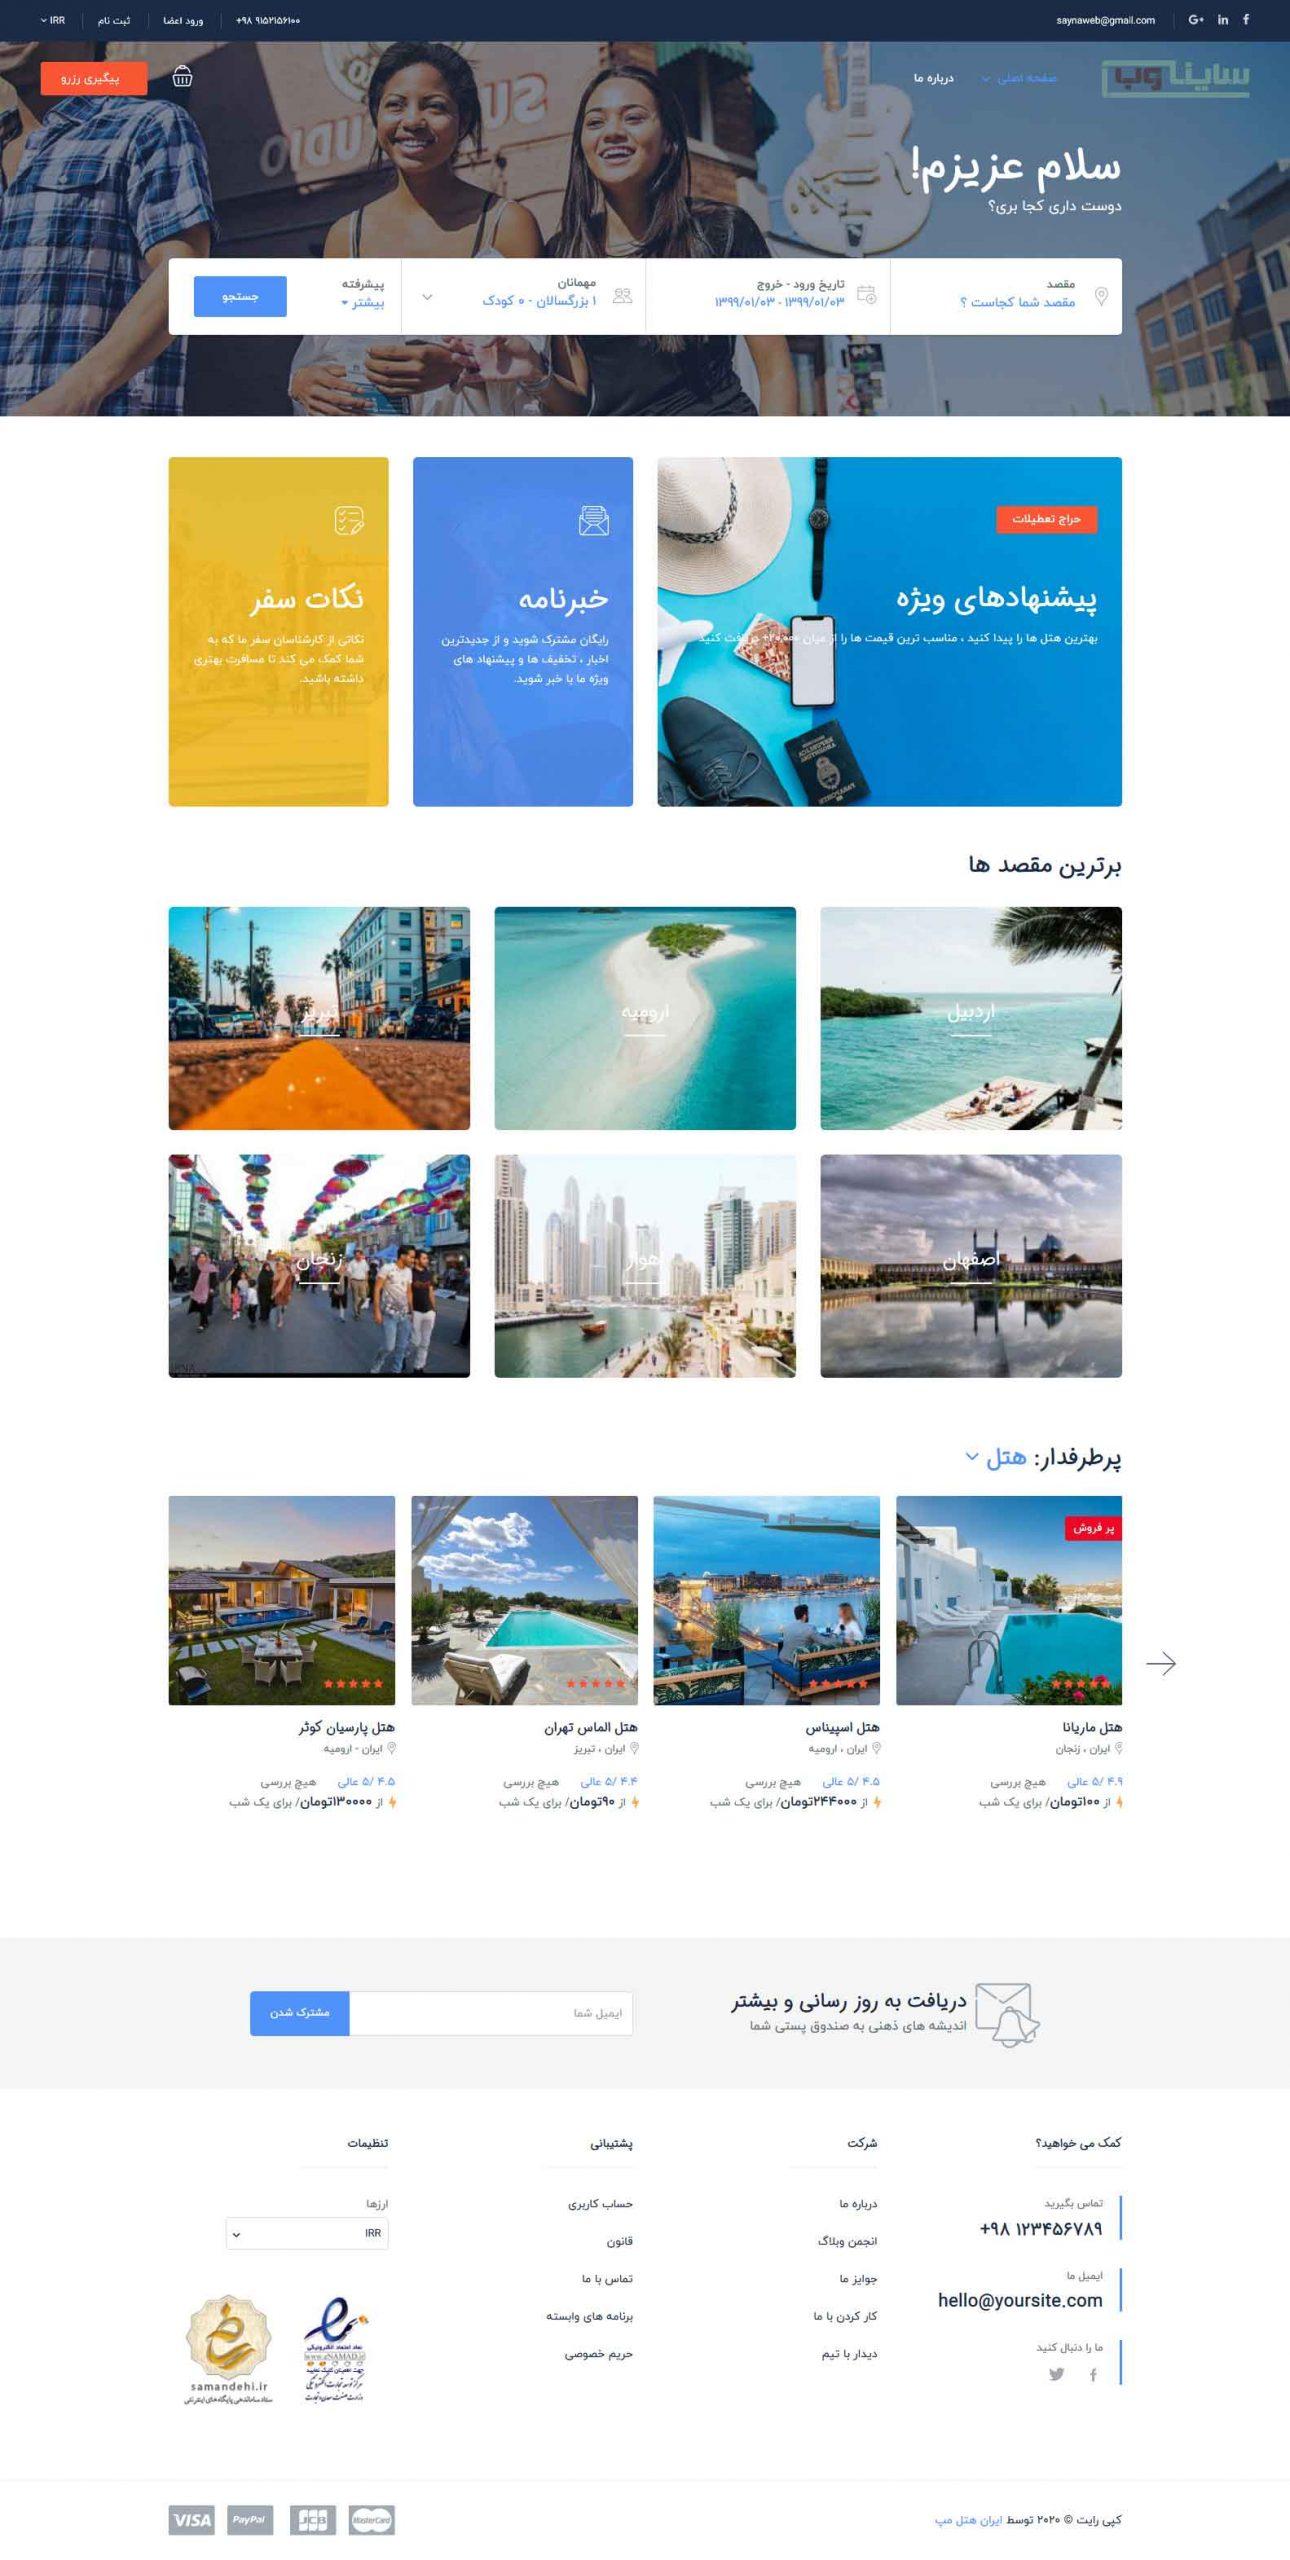 ایران هتل مپ